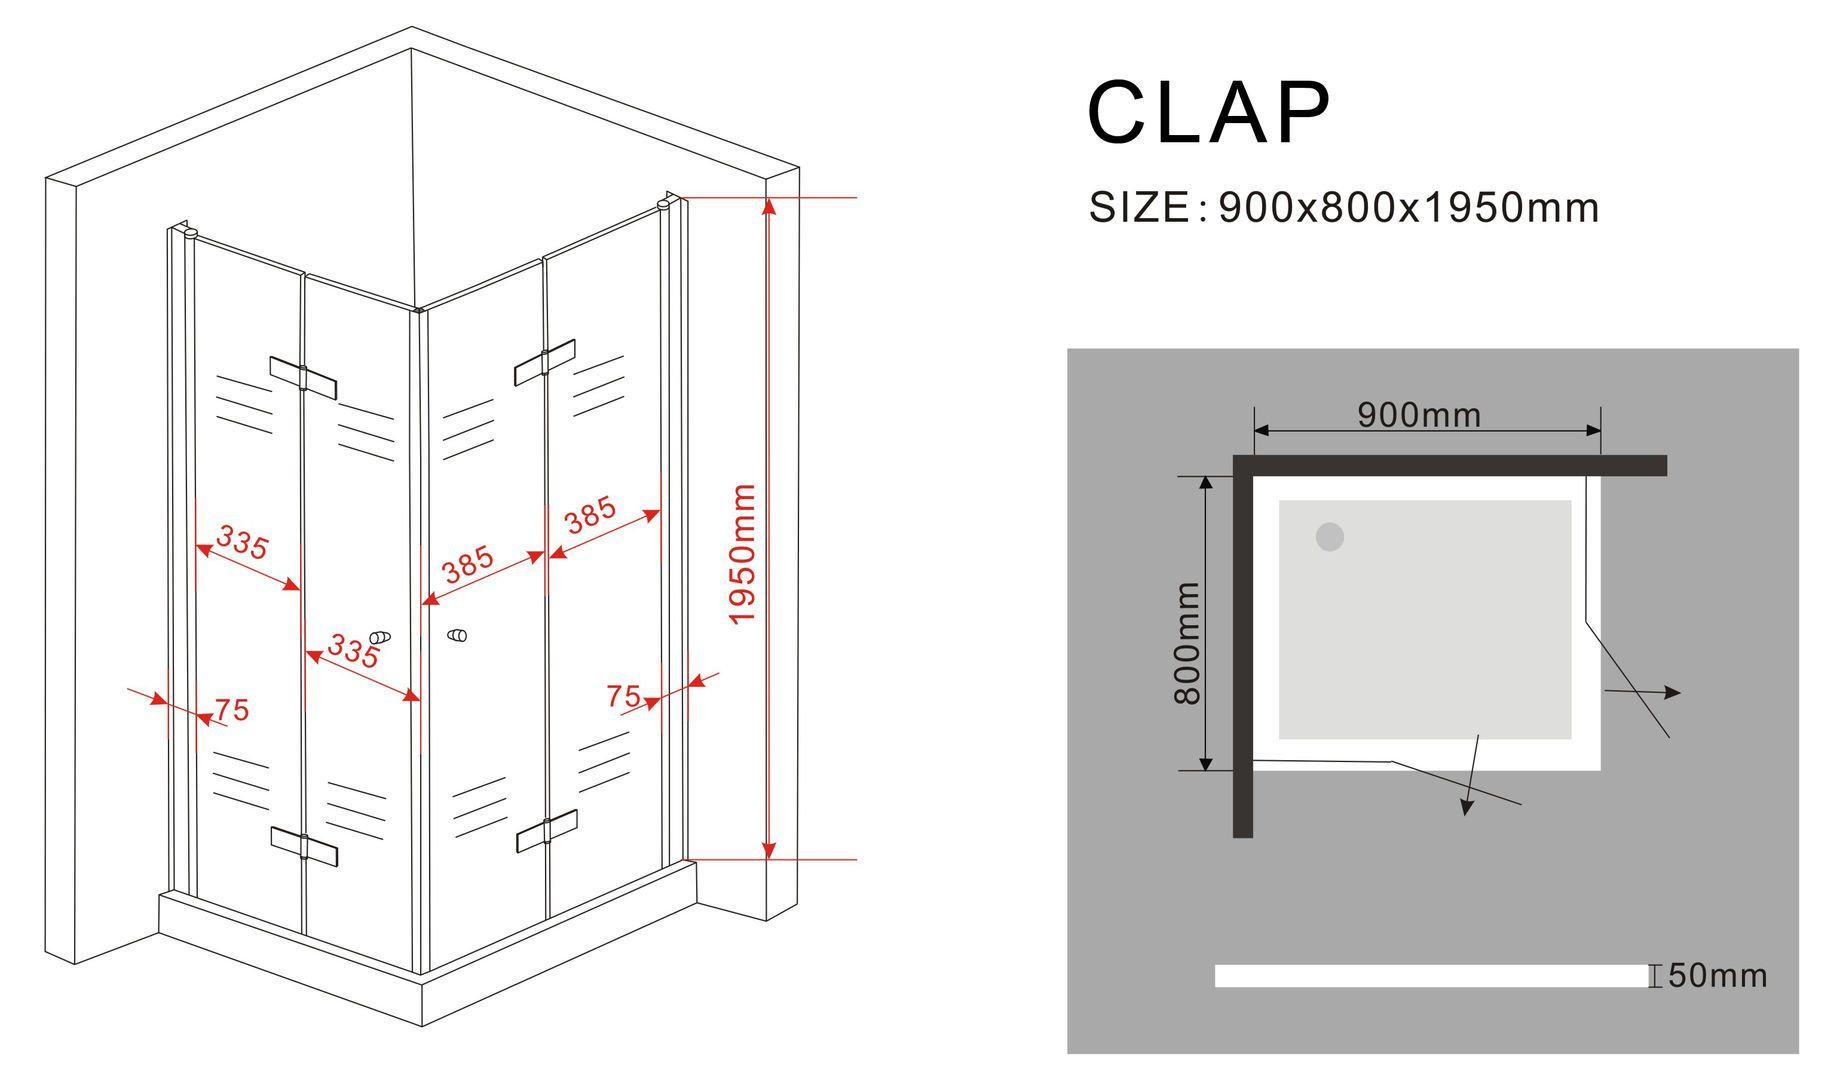 duschkabine clap 80 x 90 x 200 cm inkl duschtasse glasdeals. Black Bedroom Furniture Sets. Home Design Ideas